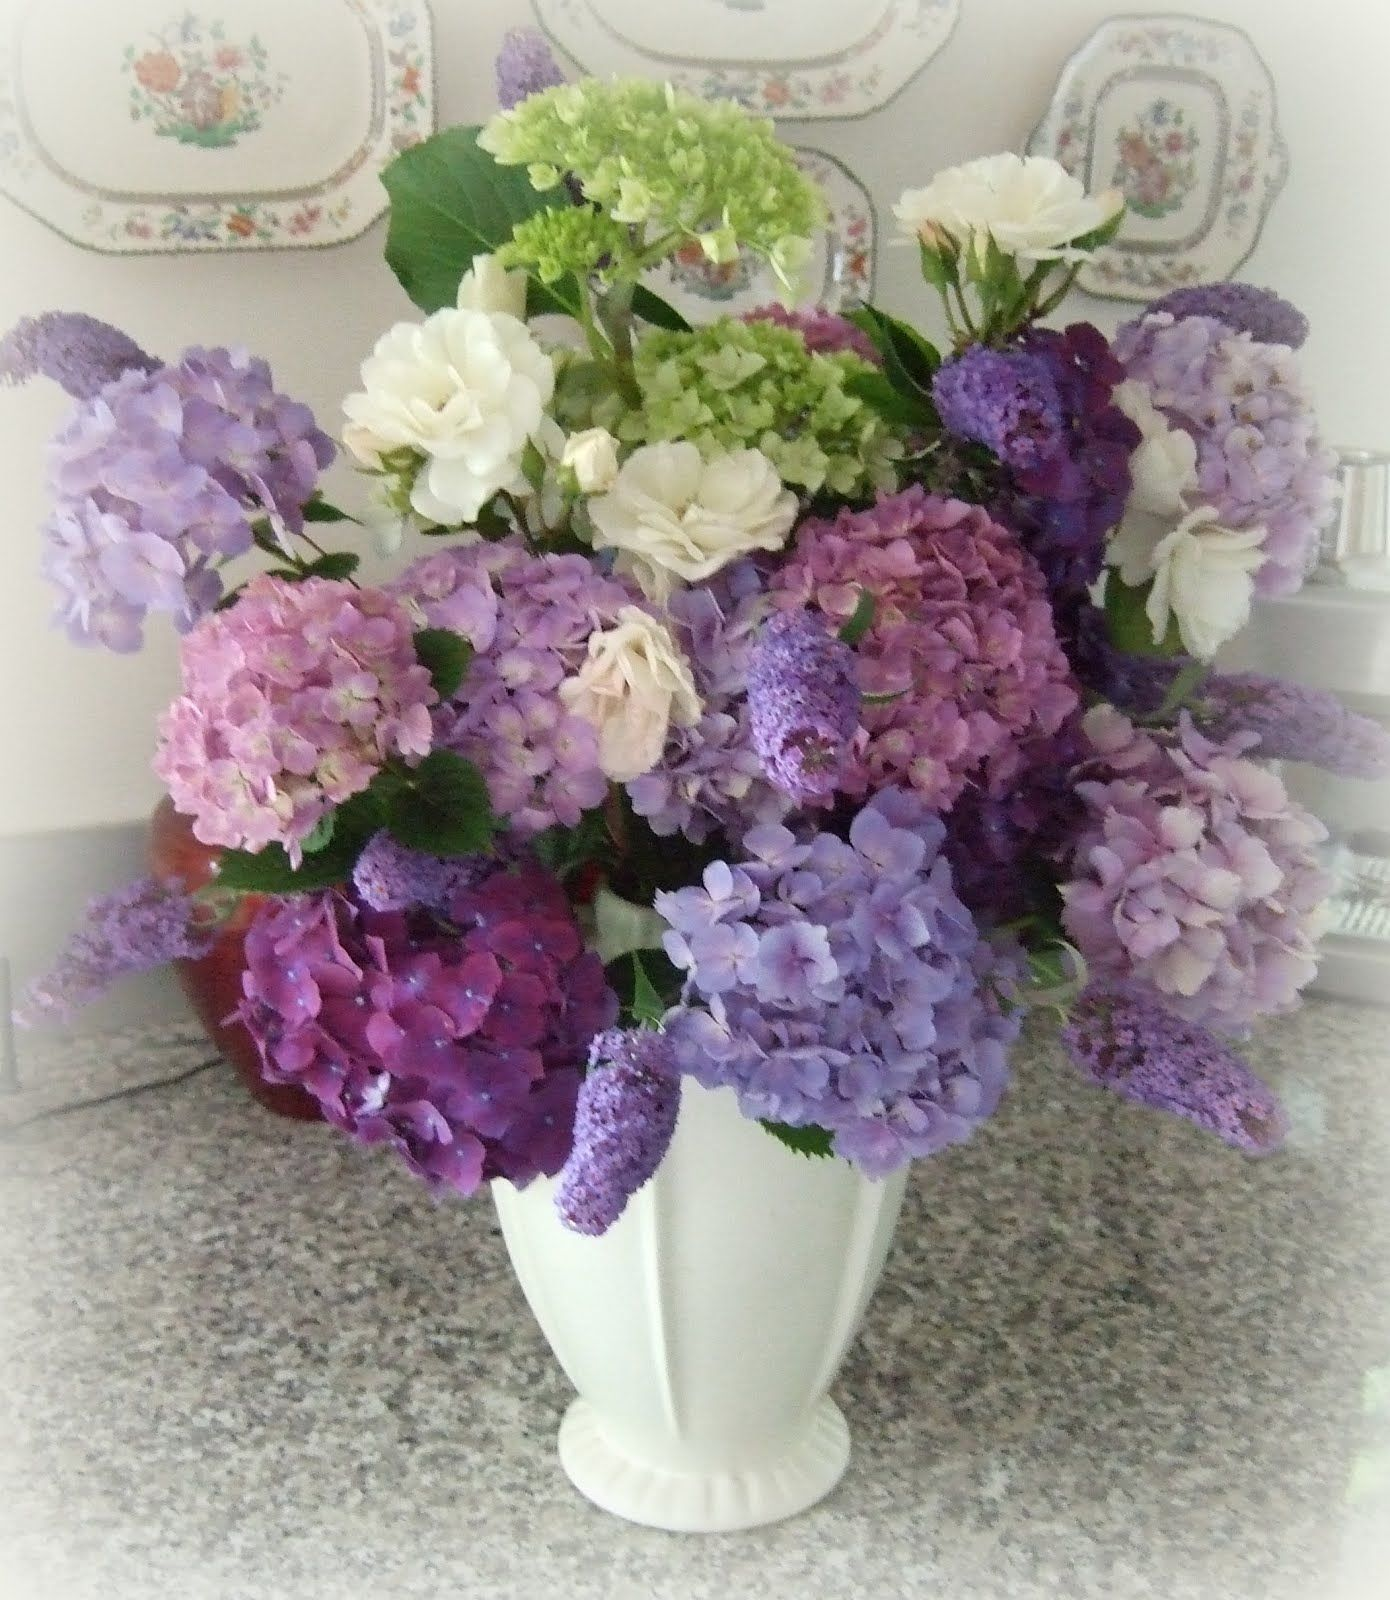 Every Stitch Christmas hydrangea bouquet from Hilda s garden